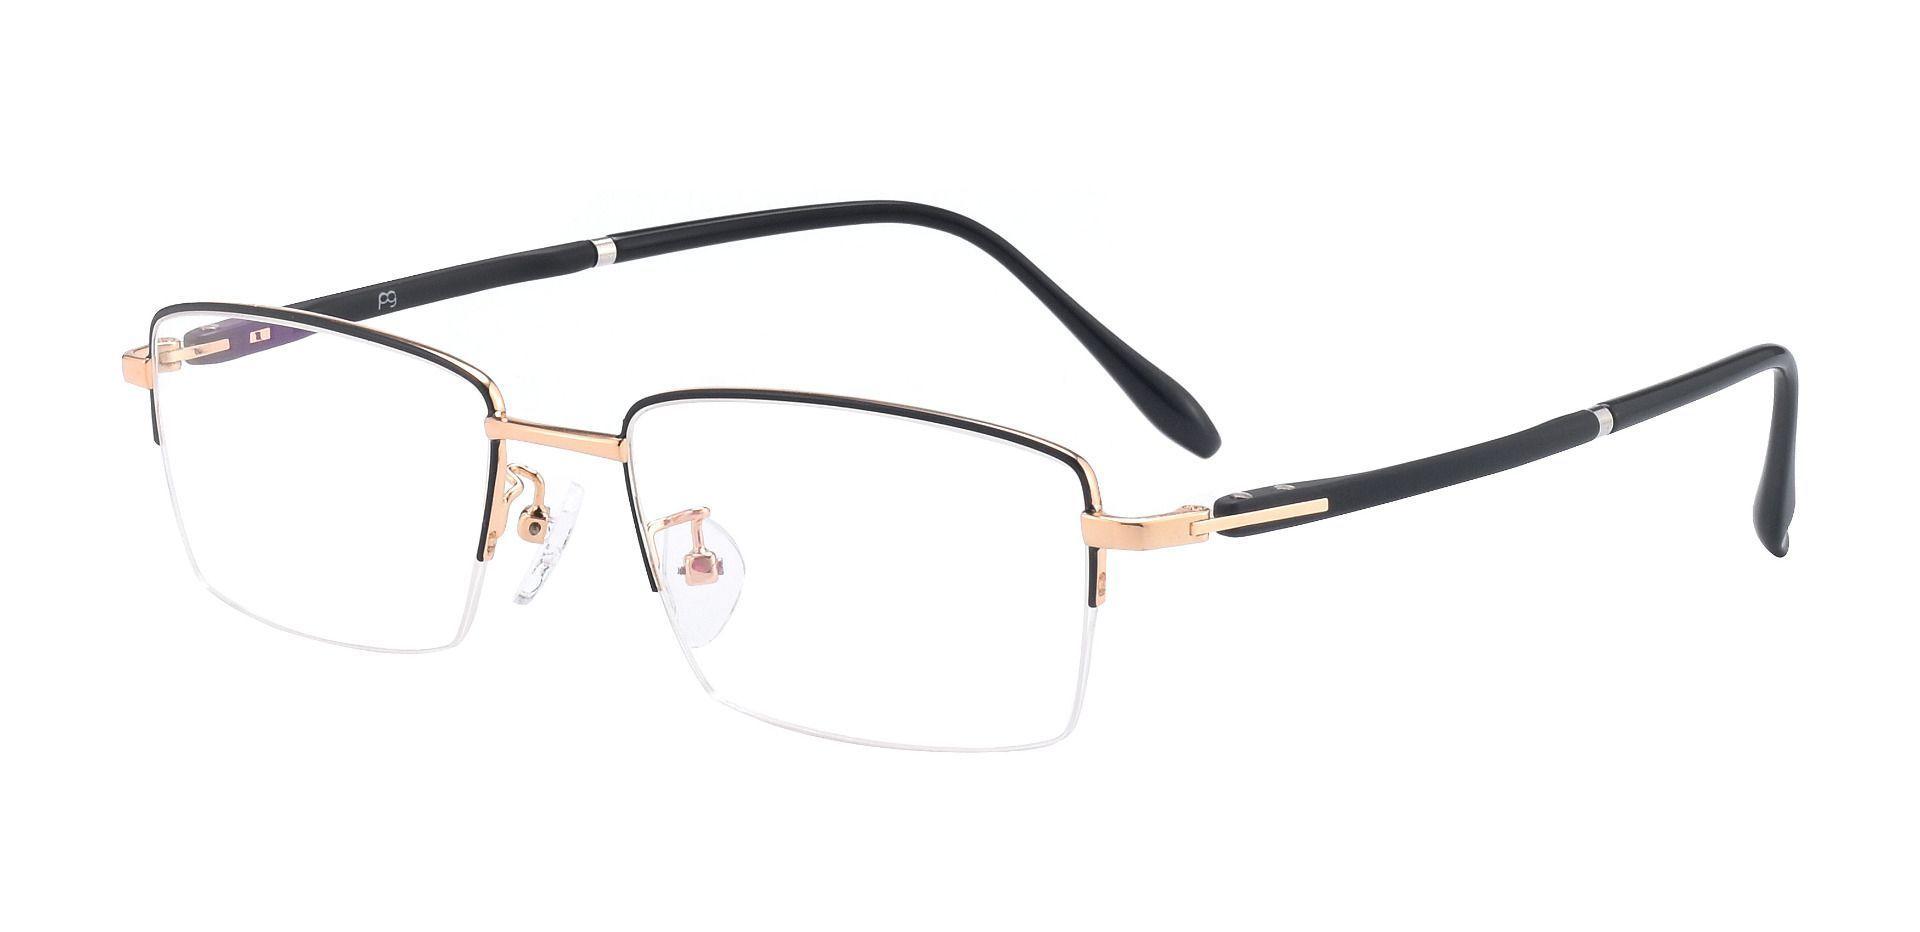 Roswell Rectangle Prescription Glasses - Black/gold